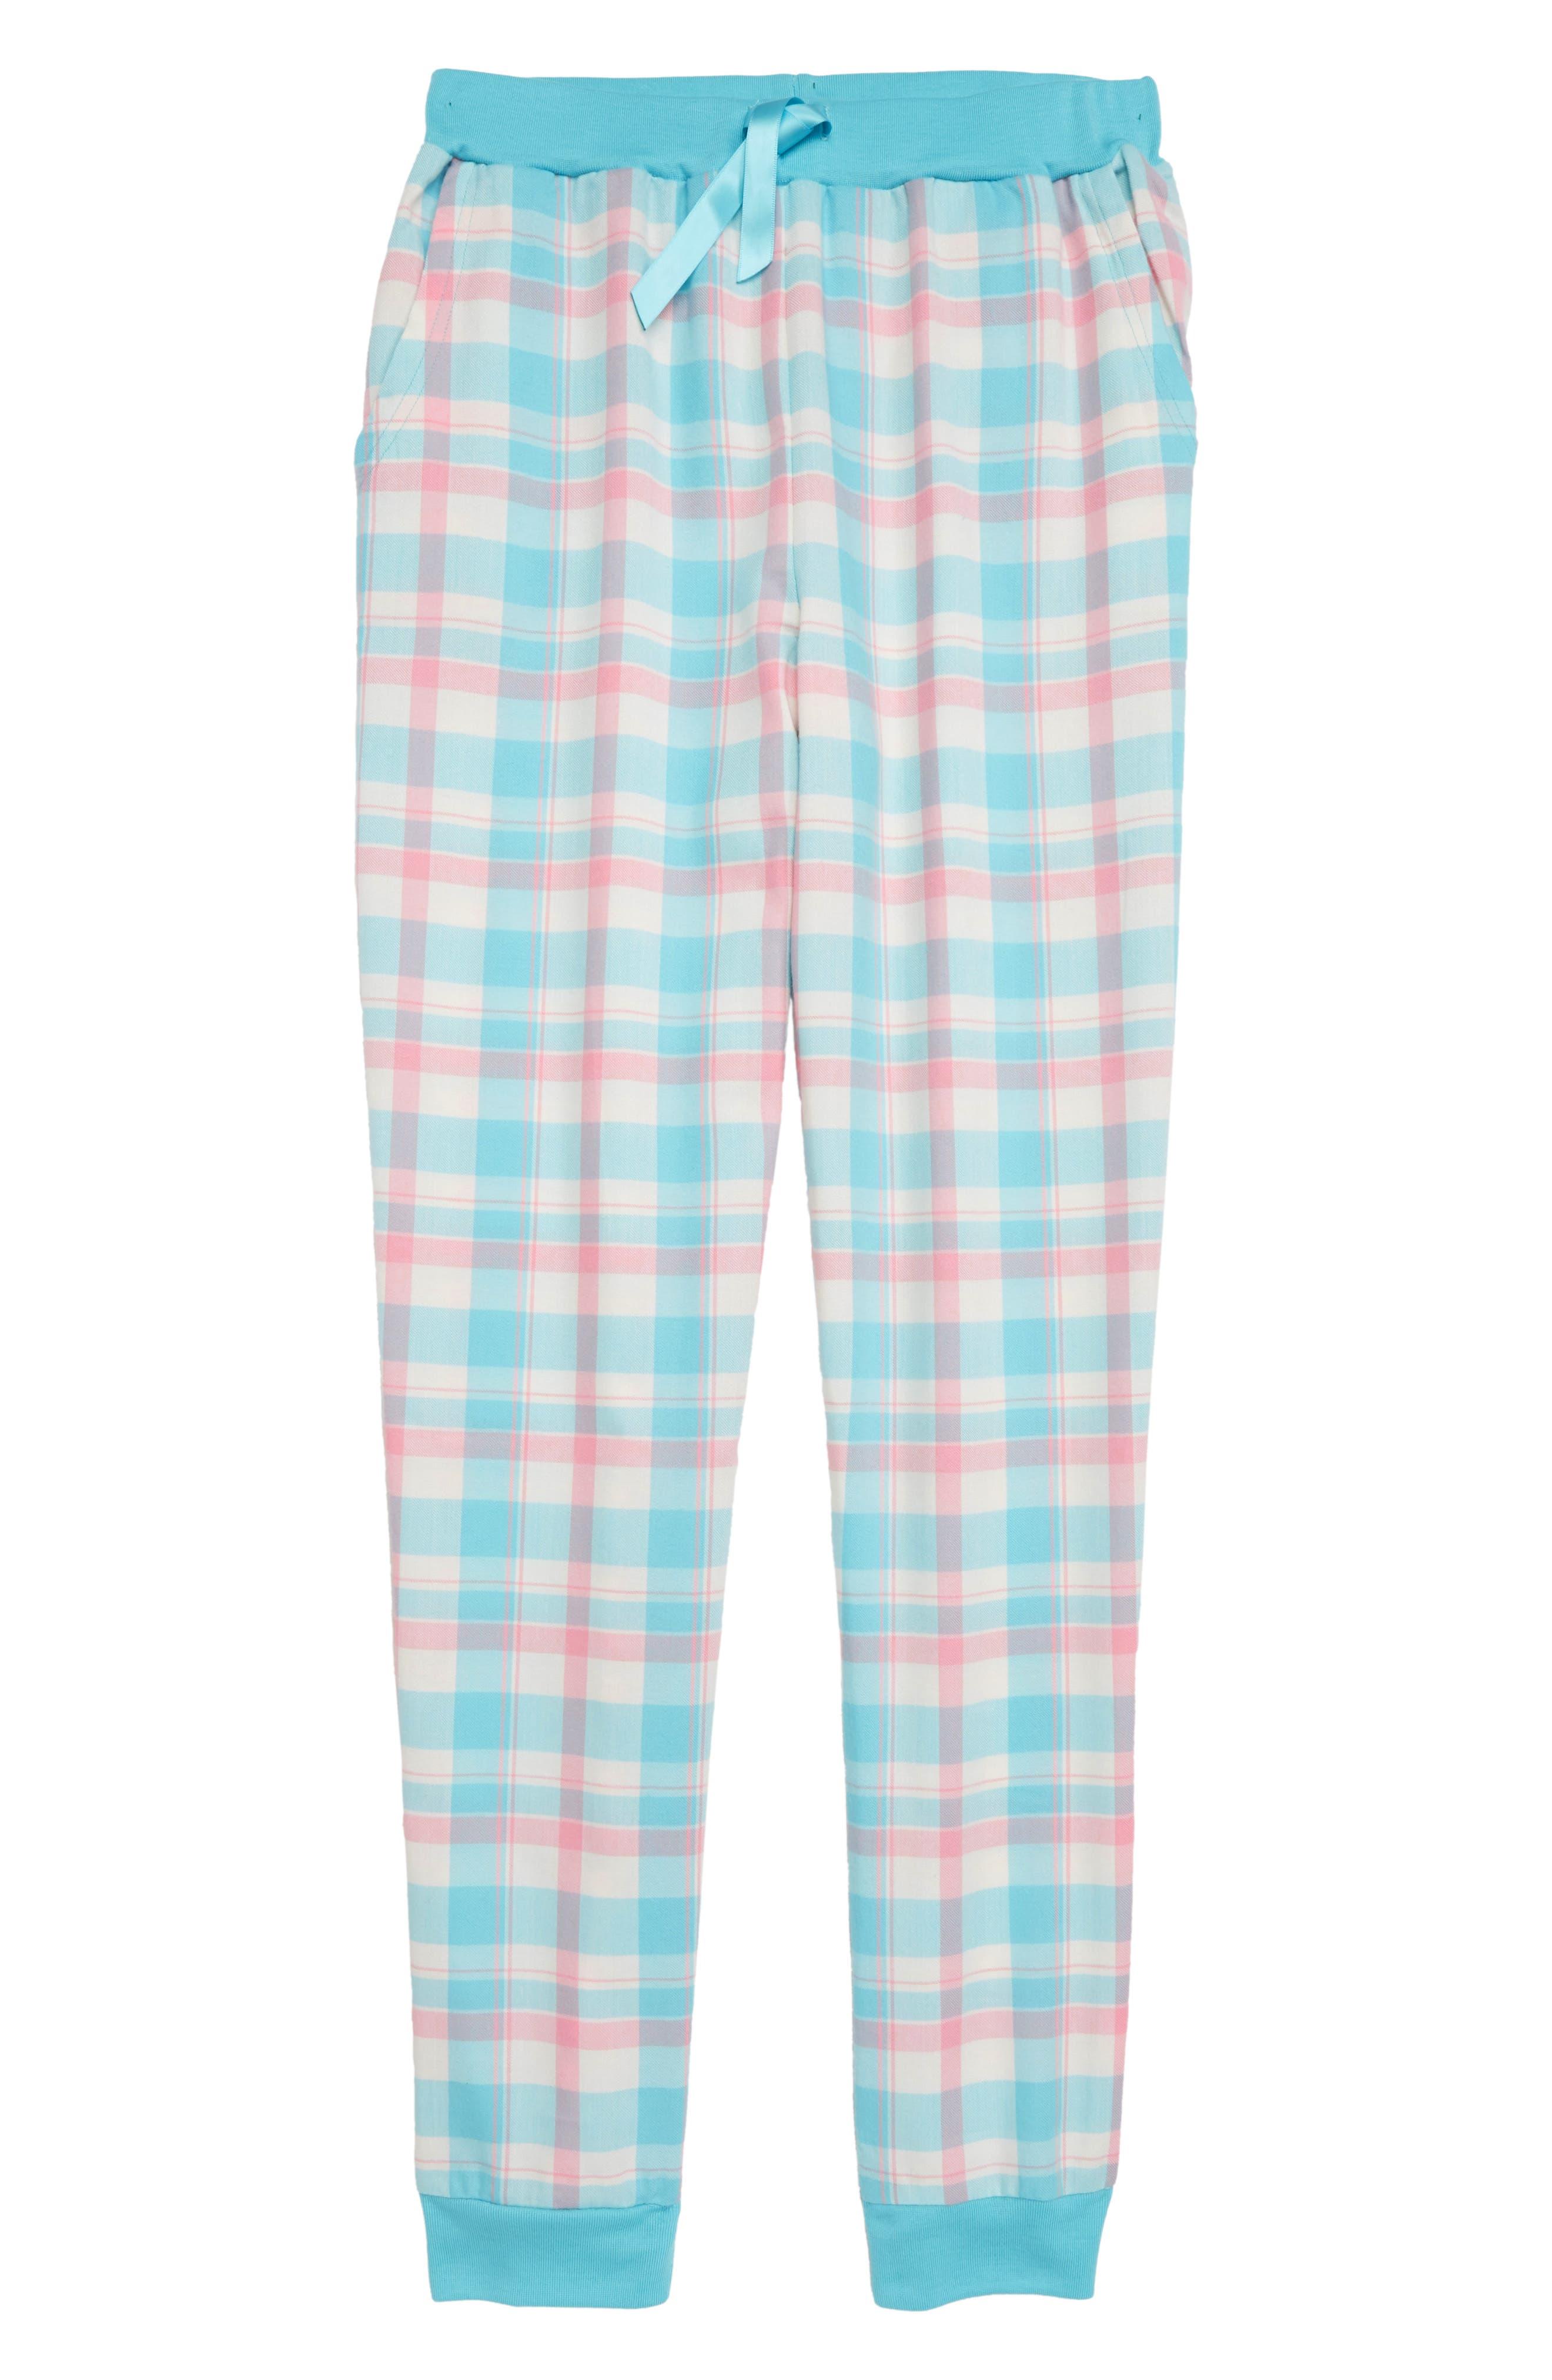 Flannel Pajama Pants,                         Main,                         color, TEAL CAPRI PLAID